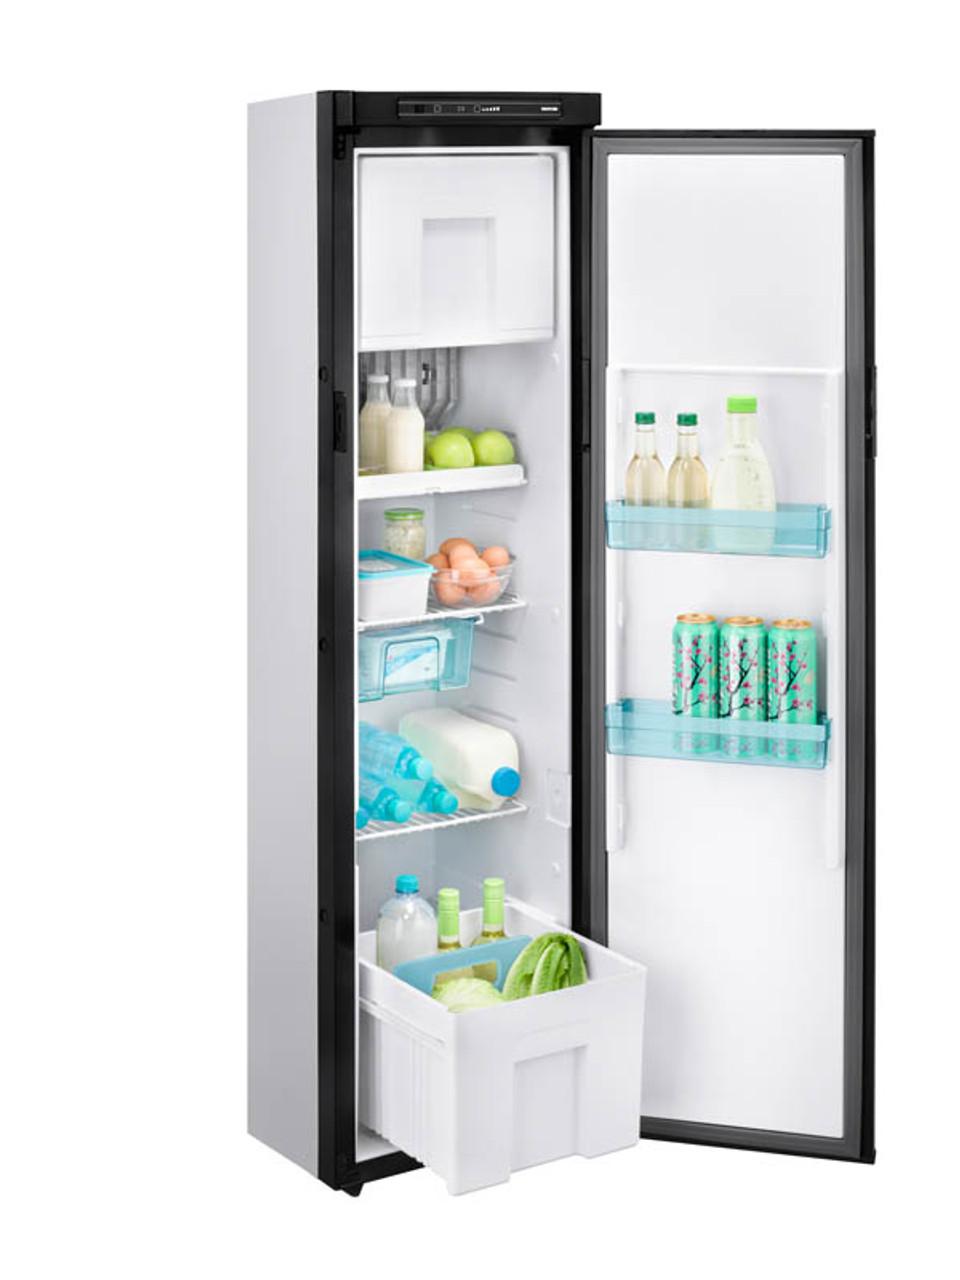 Thetford N3142 3 Way Caravan Motorhome Campervan Absorption Fridge Freezer open with drawer out